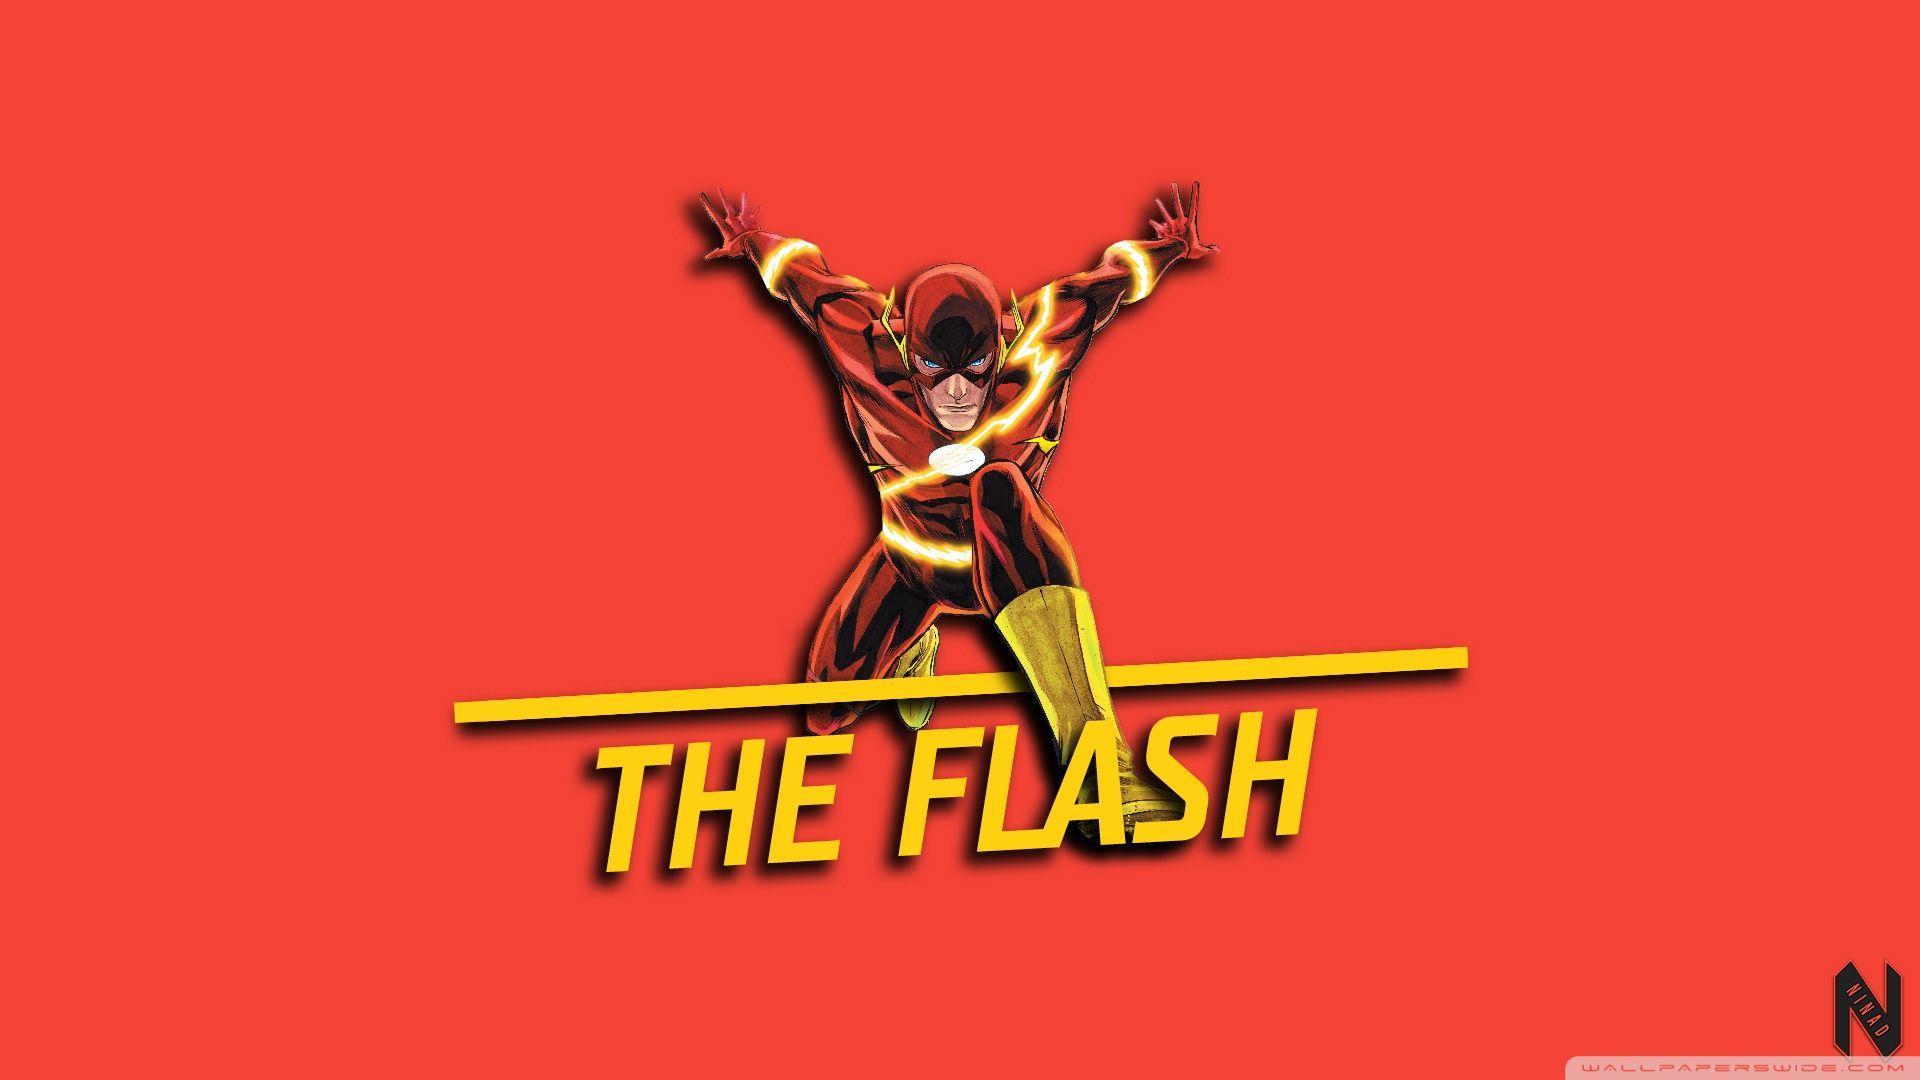 The Flash Desktop Wallpapers - Top Free The Flash Desktop Backgrounds -  WallpaperAccess